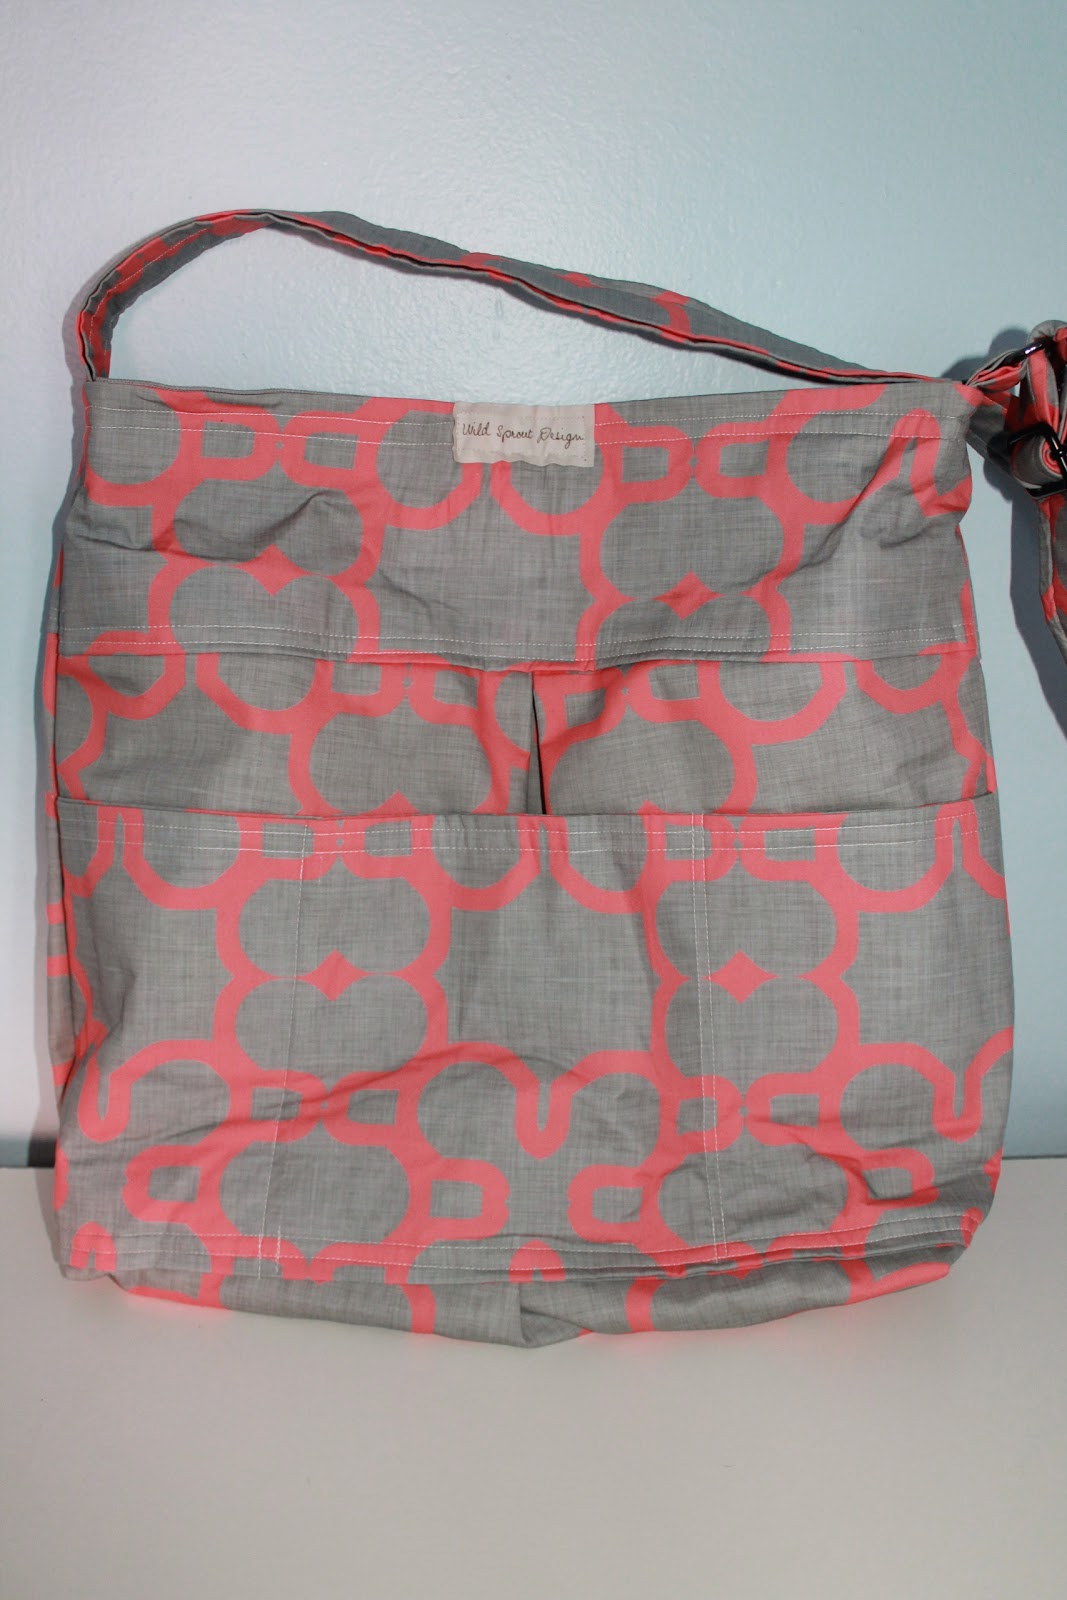 Meet the Sullivans : Diaper Bag Essentials from Julie of The